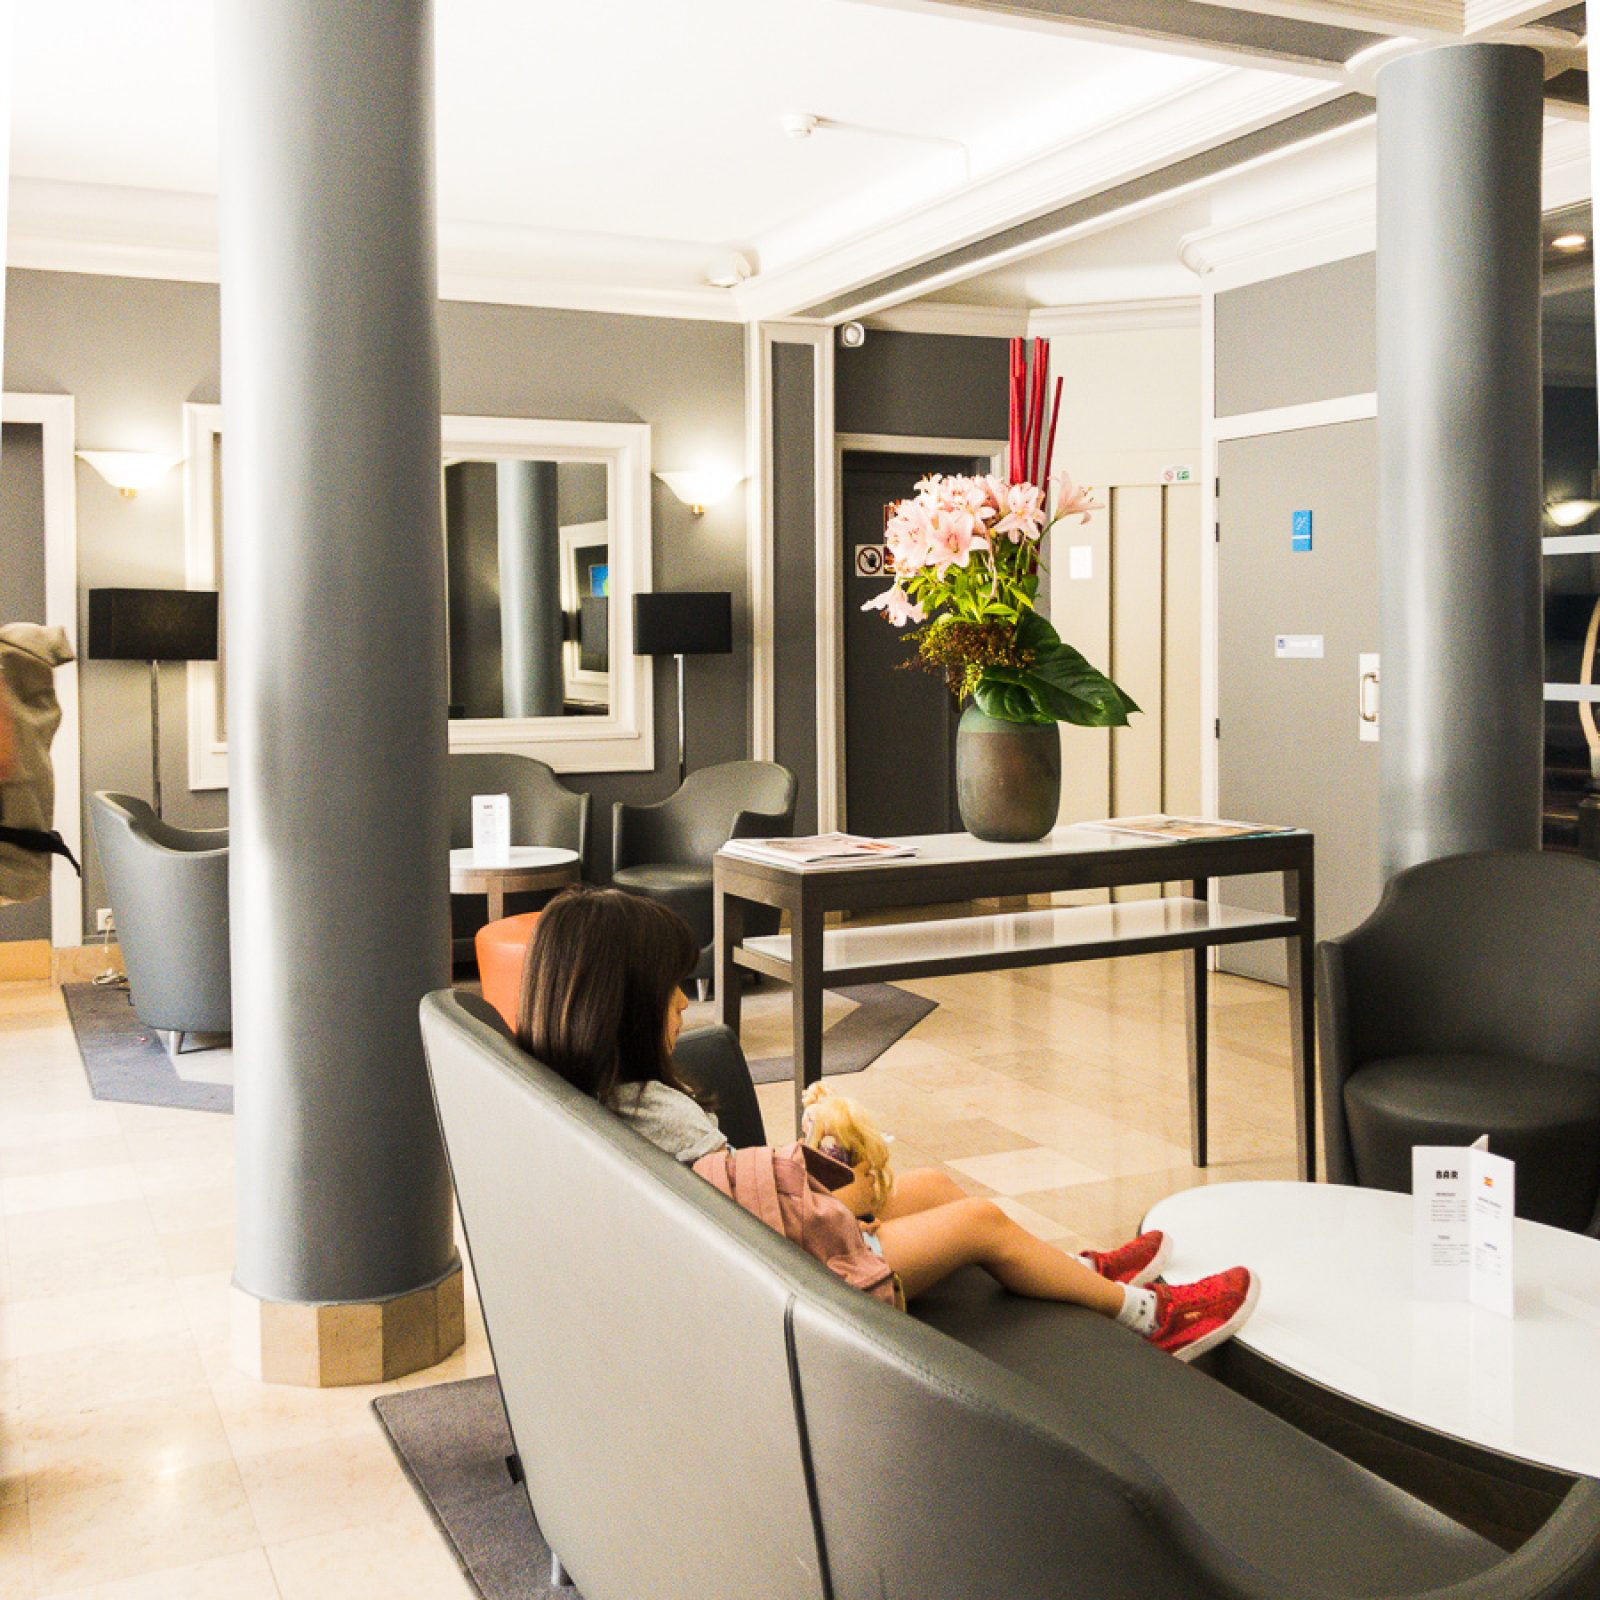 tim-hotel opera blanche hotel parigi 004